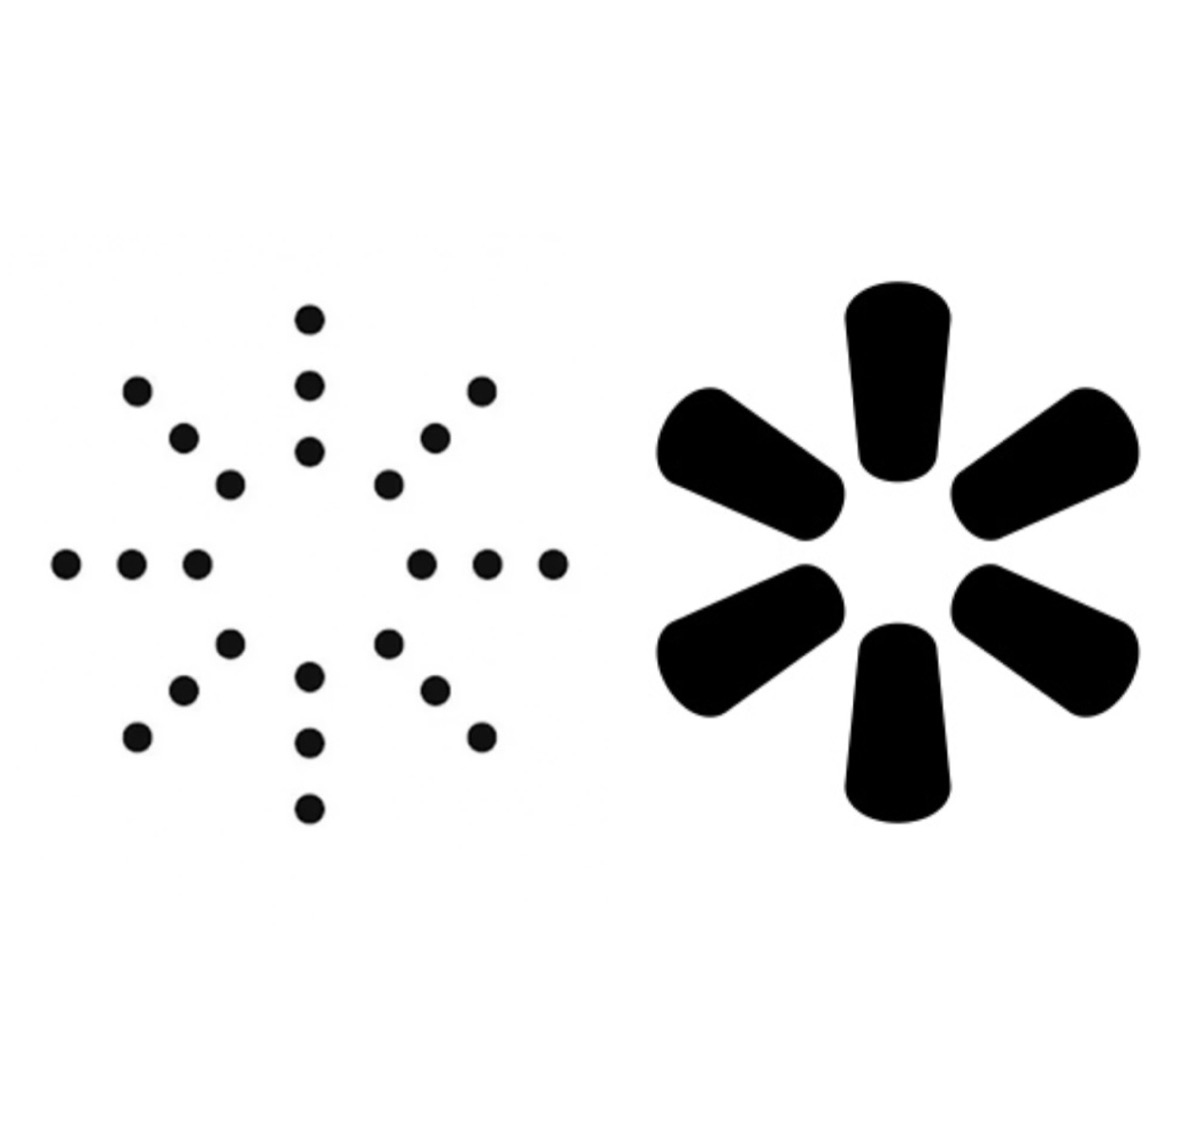 proposed yeezy sunburst dot logo next to black solid walmart sunburst logo